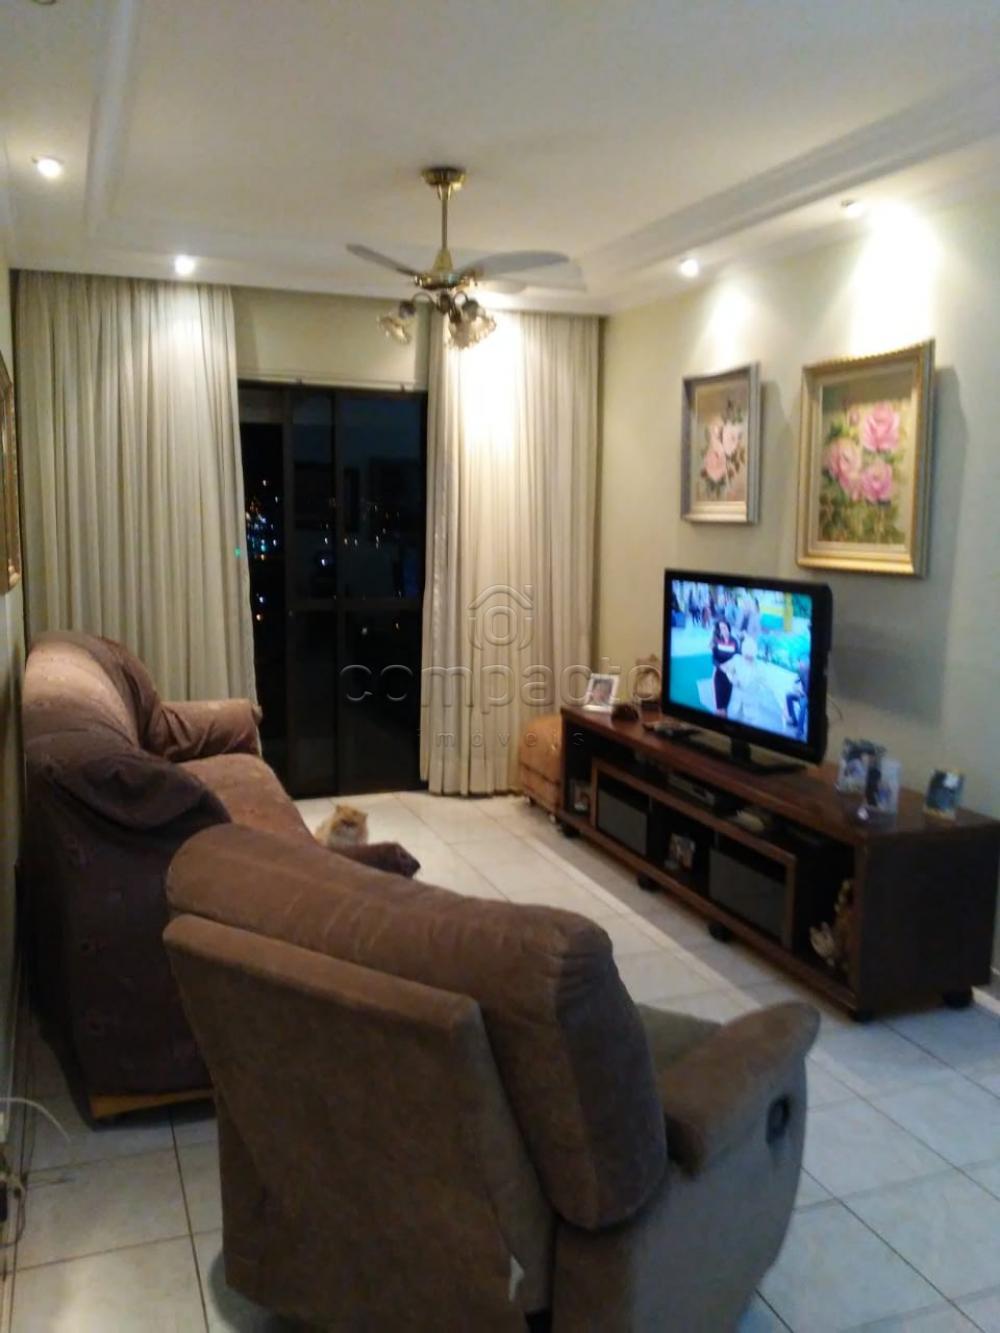 Sao Jose do Rio Preto Apartamento Venda R$490.000,00 Condominio R$480,00 3 Dormitorios 1 Suite Area construida 125.00m2